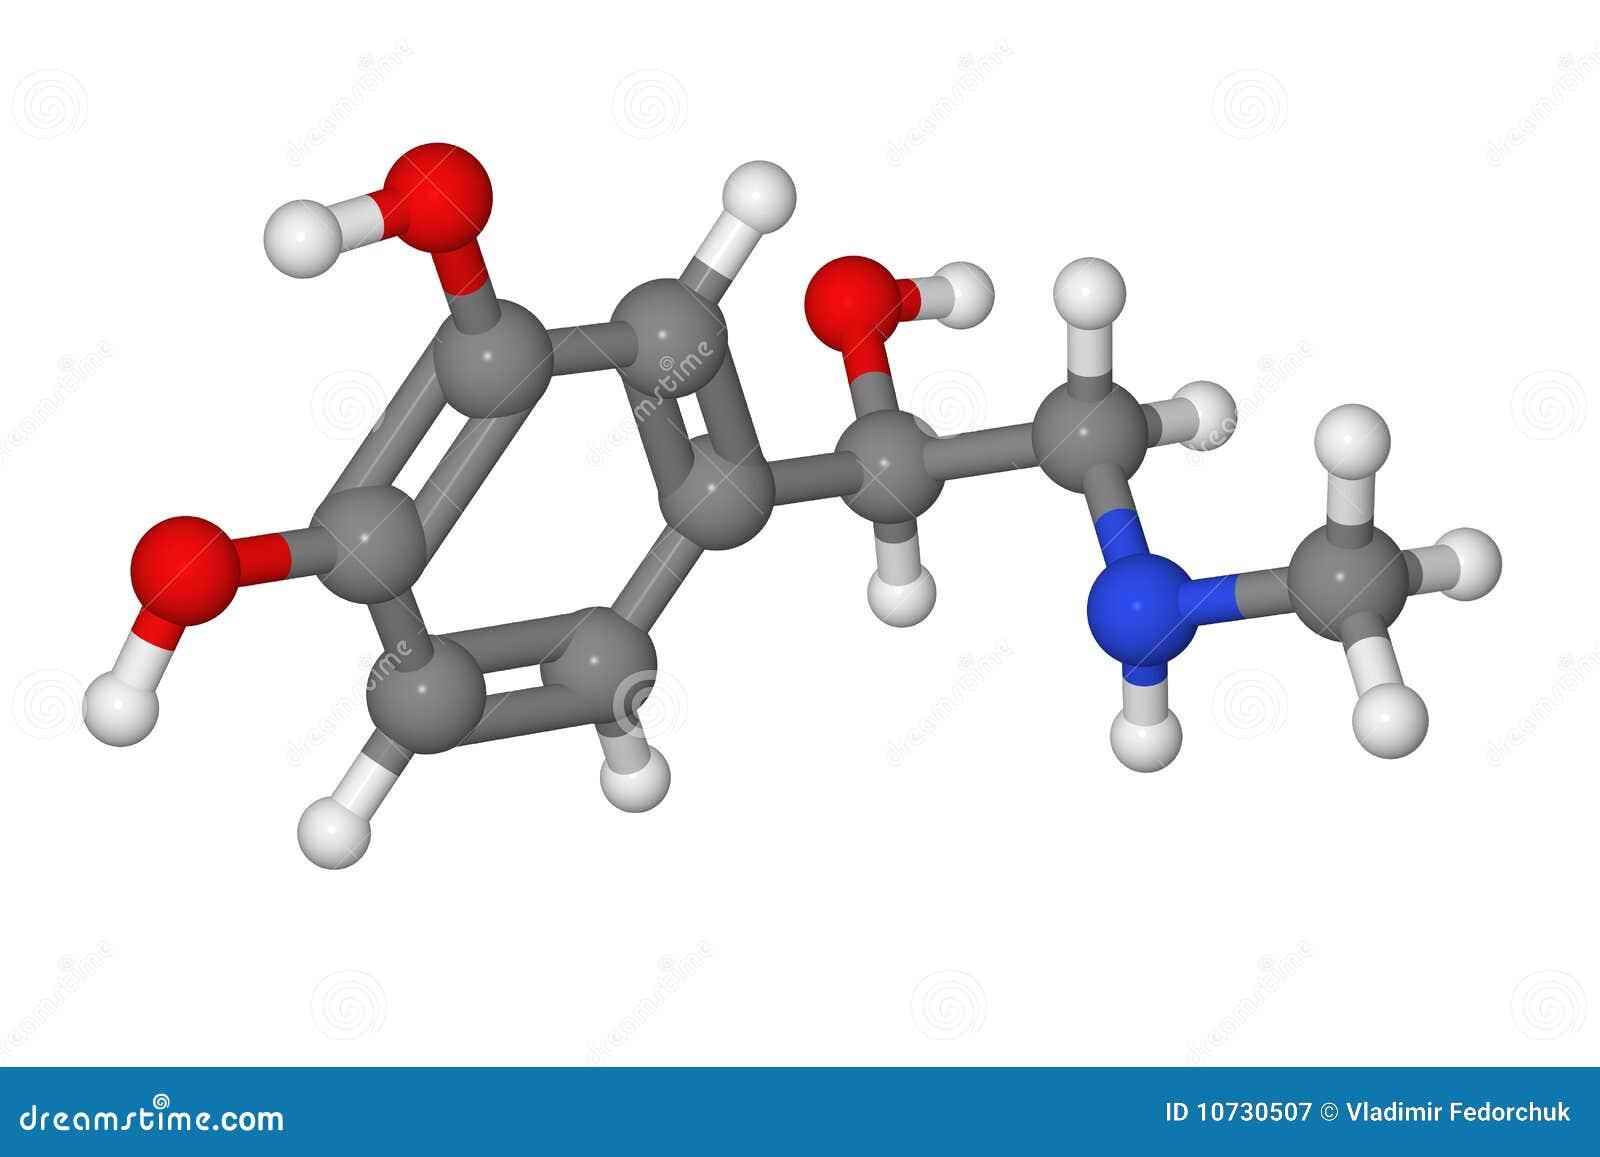 ручка молекулы модели шарика адреналина